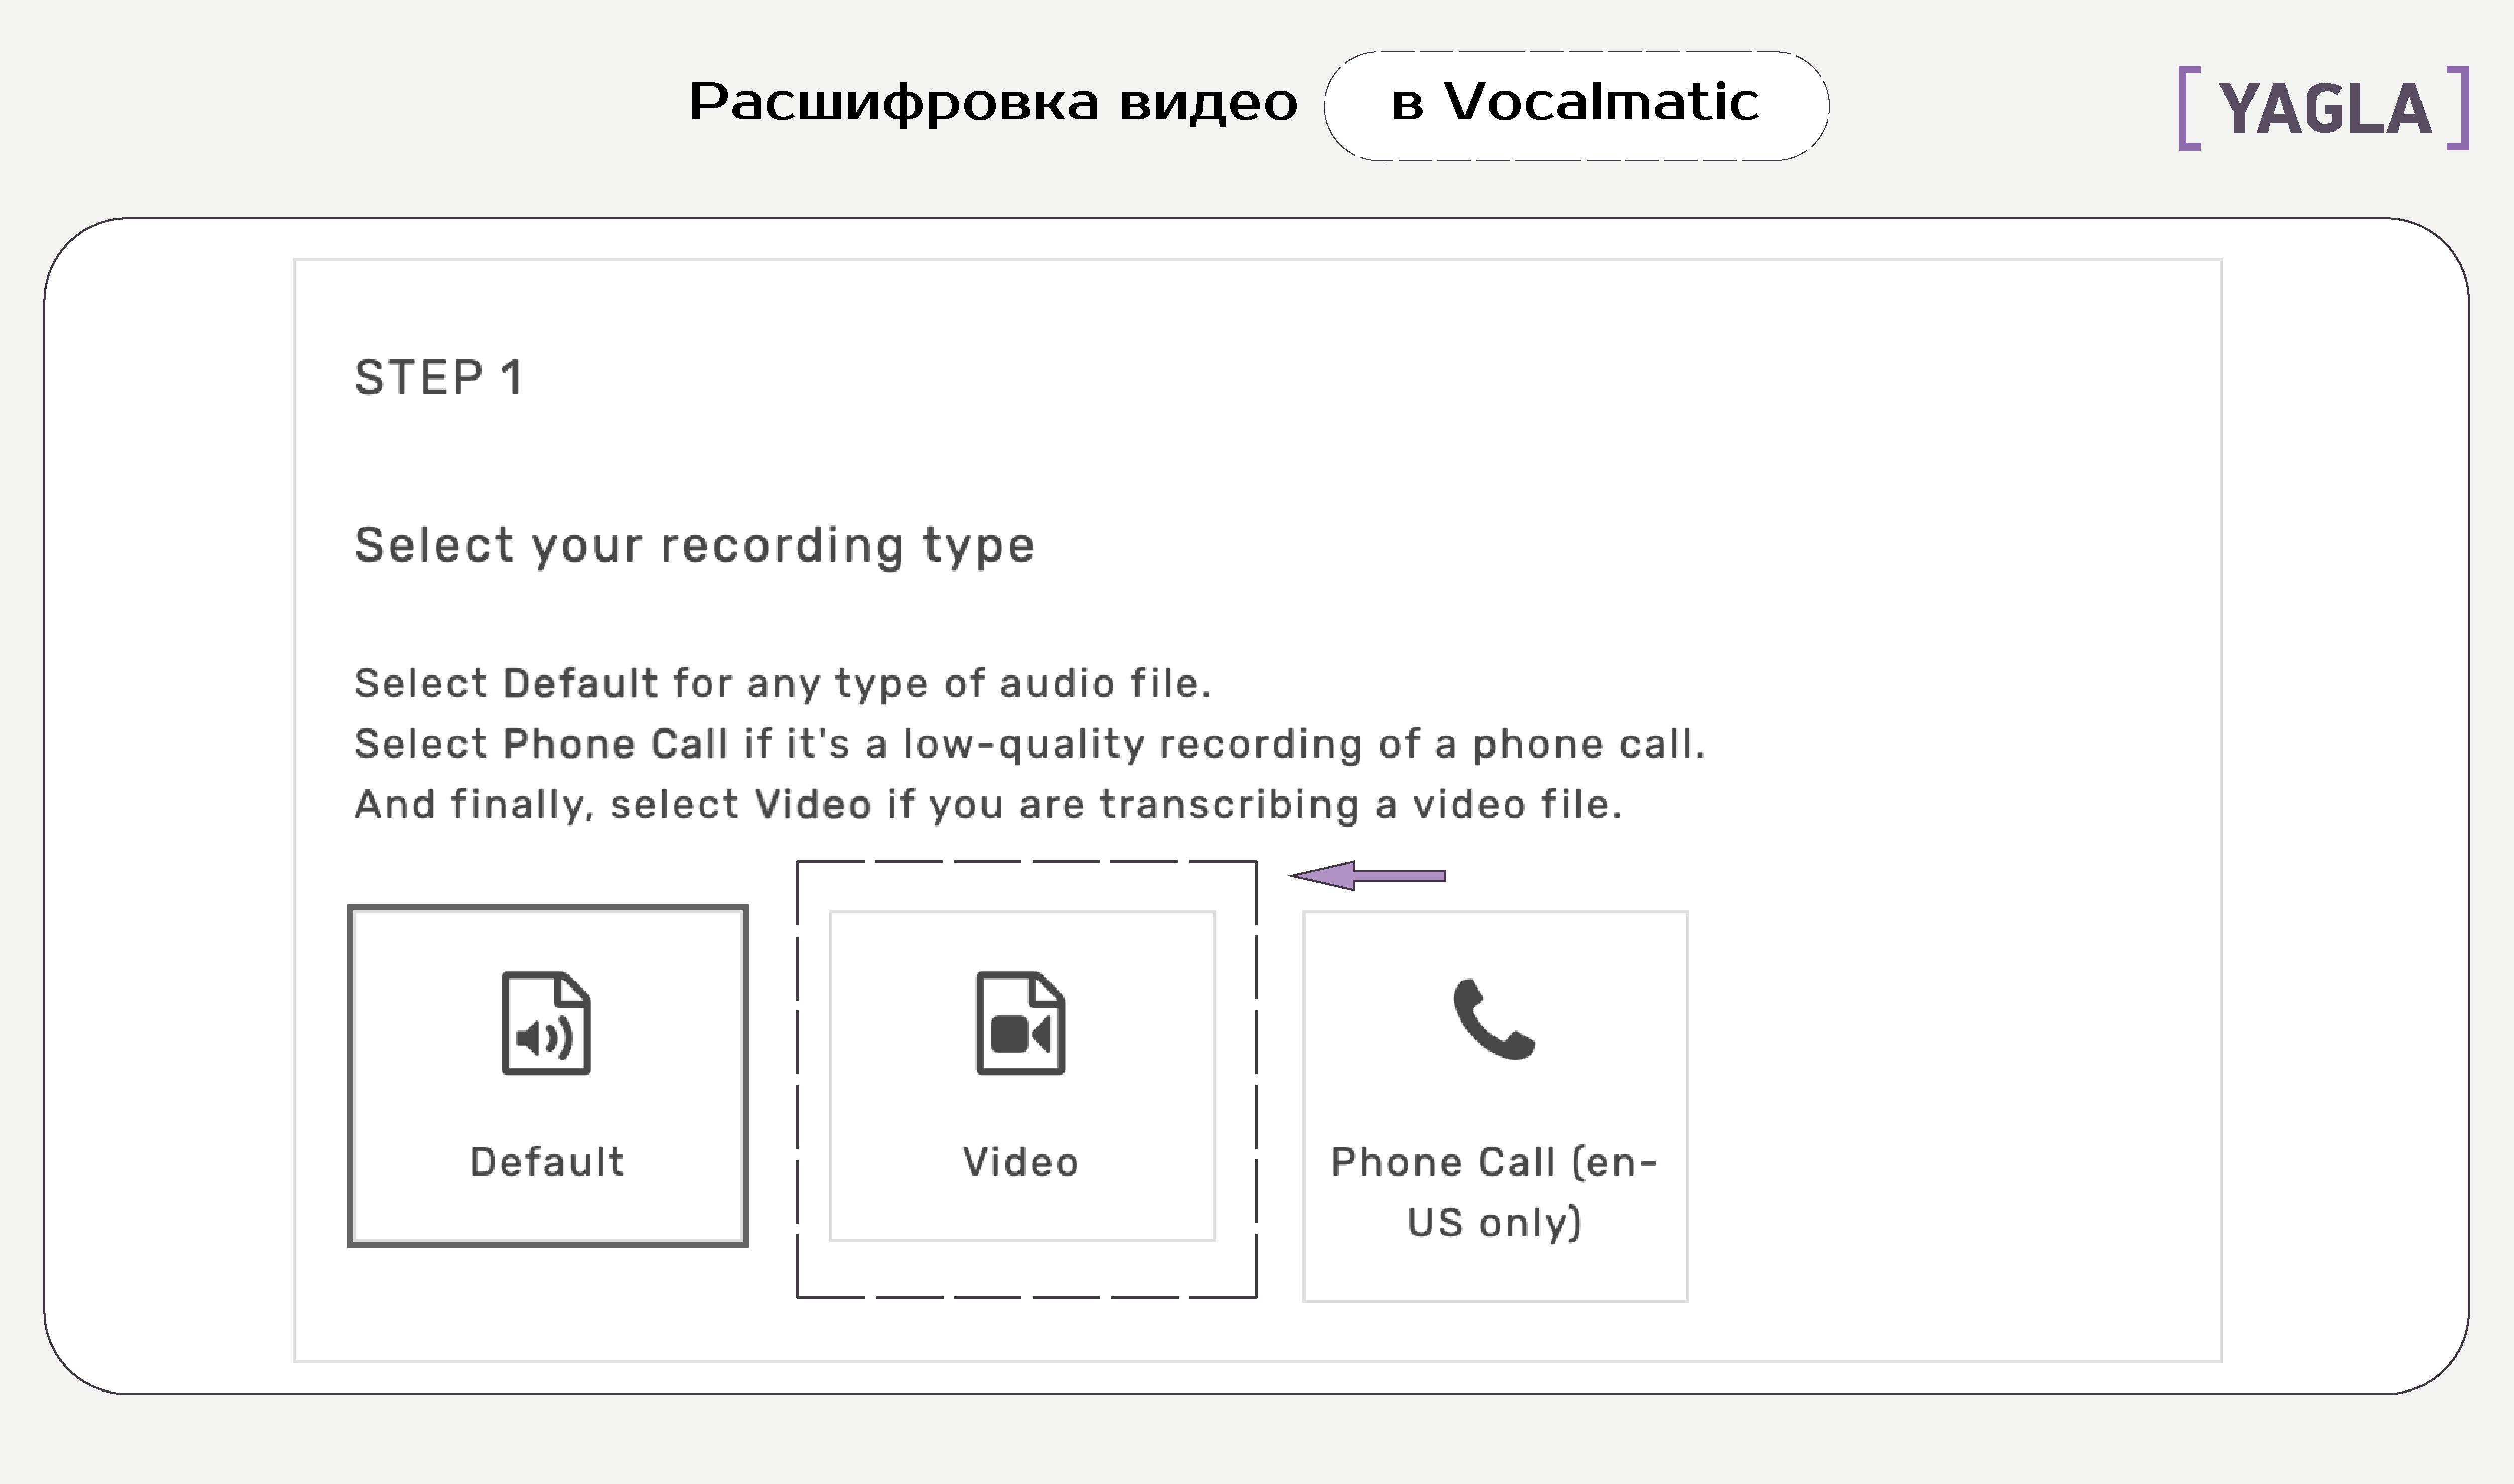 Cервис для перевода аудио в текст Vocalmatic